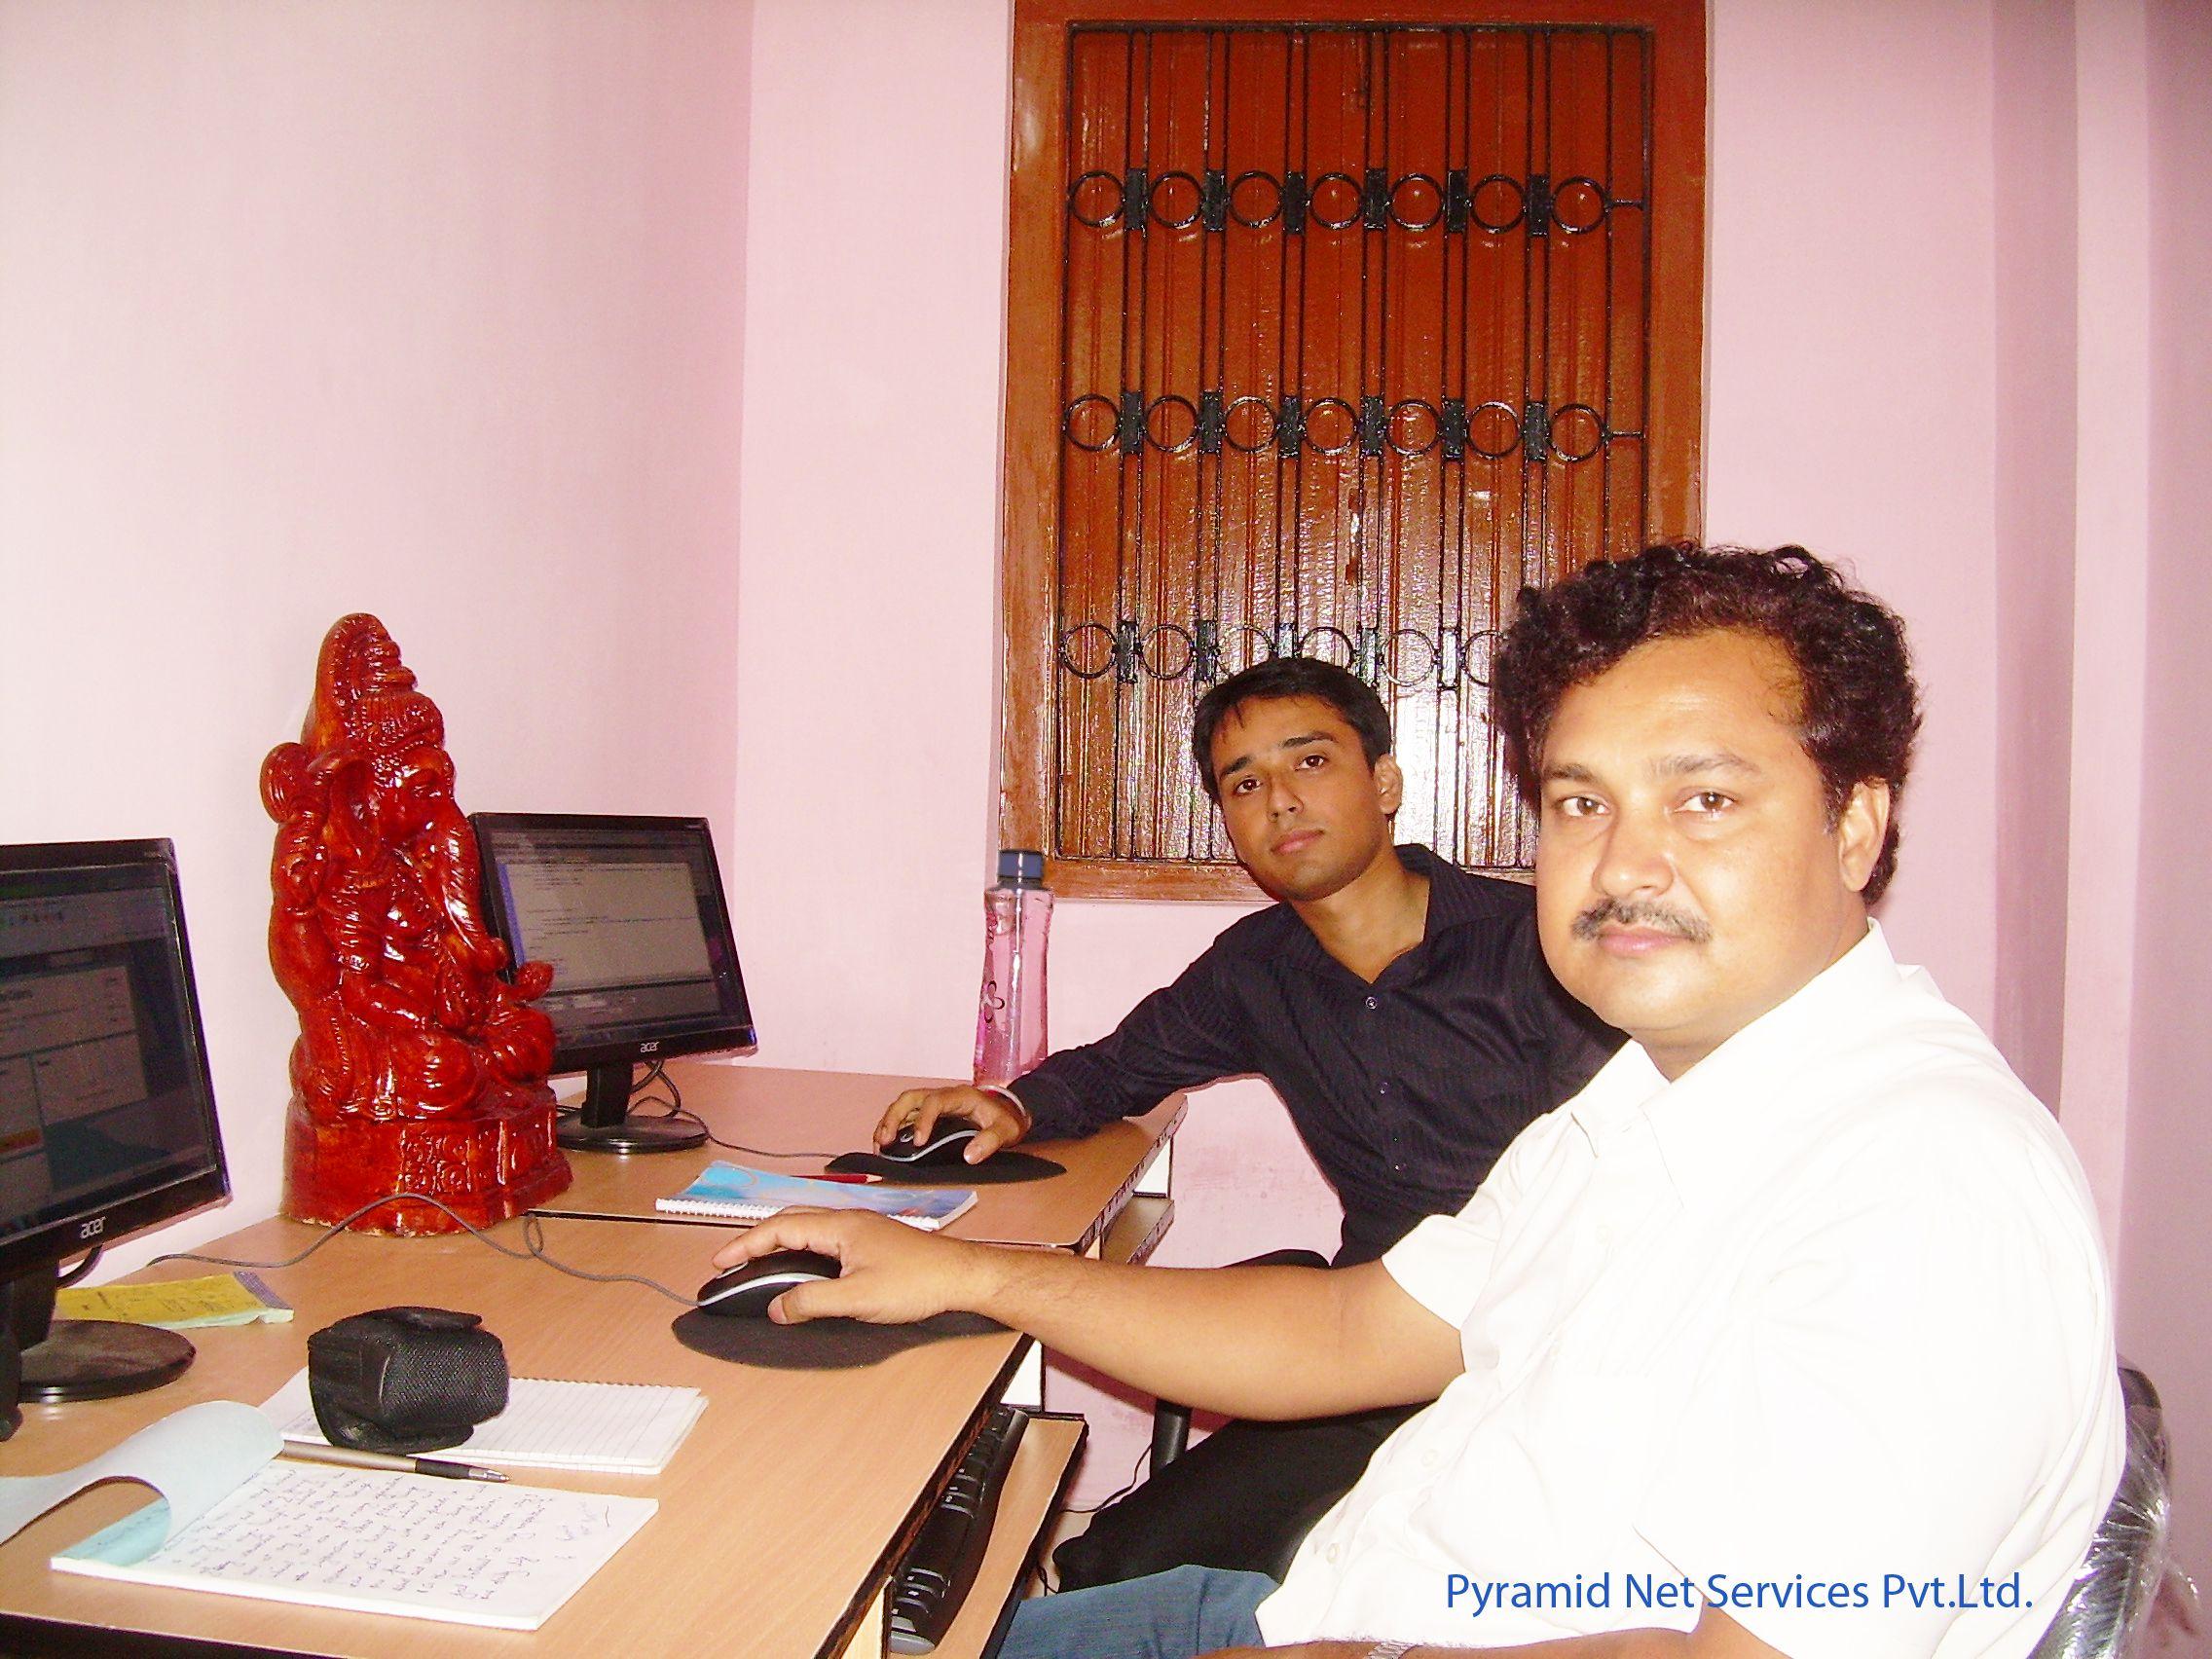 Website Designing Company In Siliguri West Bengal India We Provide Website Designing Web Social Media Marketing Services Digital Marketing Online Marketing